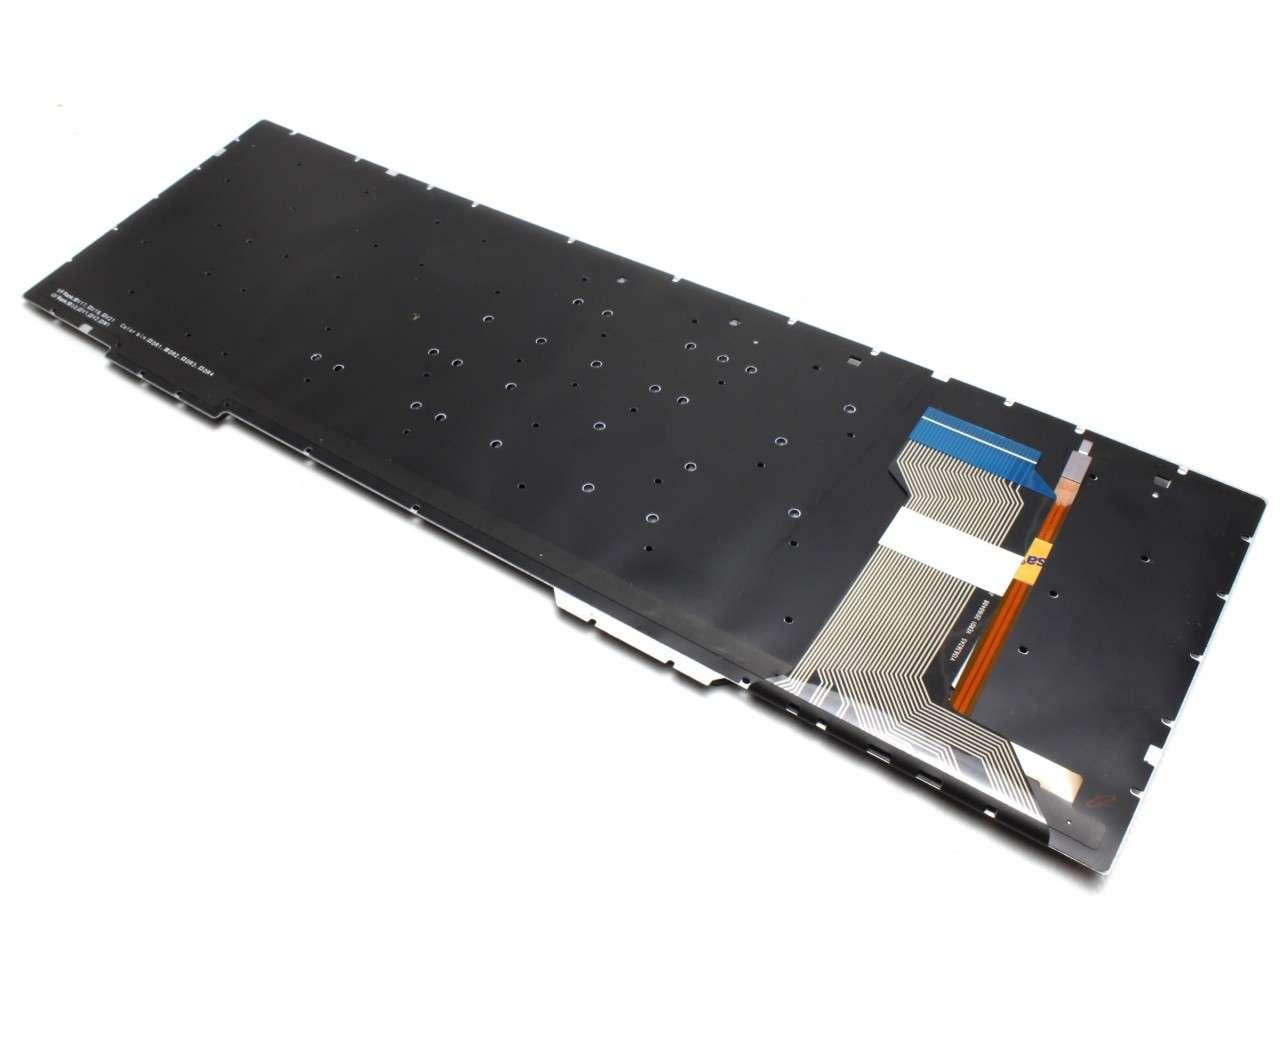 Tastatura Asus FX753VD iluminata layout US fara rama enter mic imagine powerlaptop.ro 2021